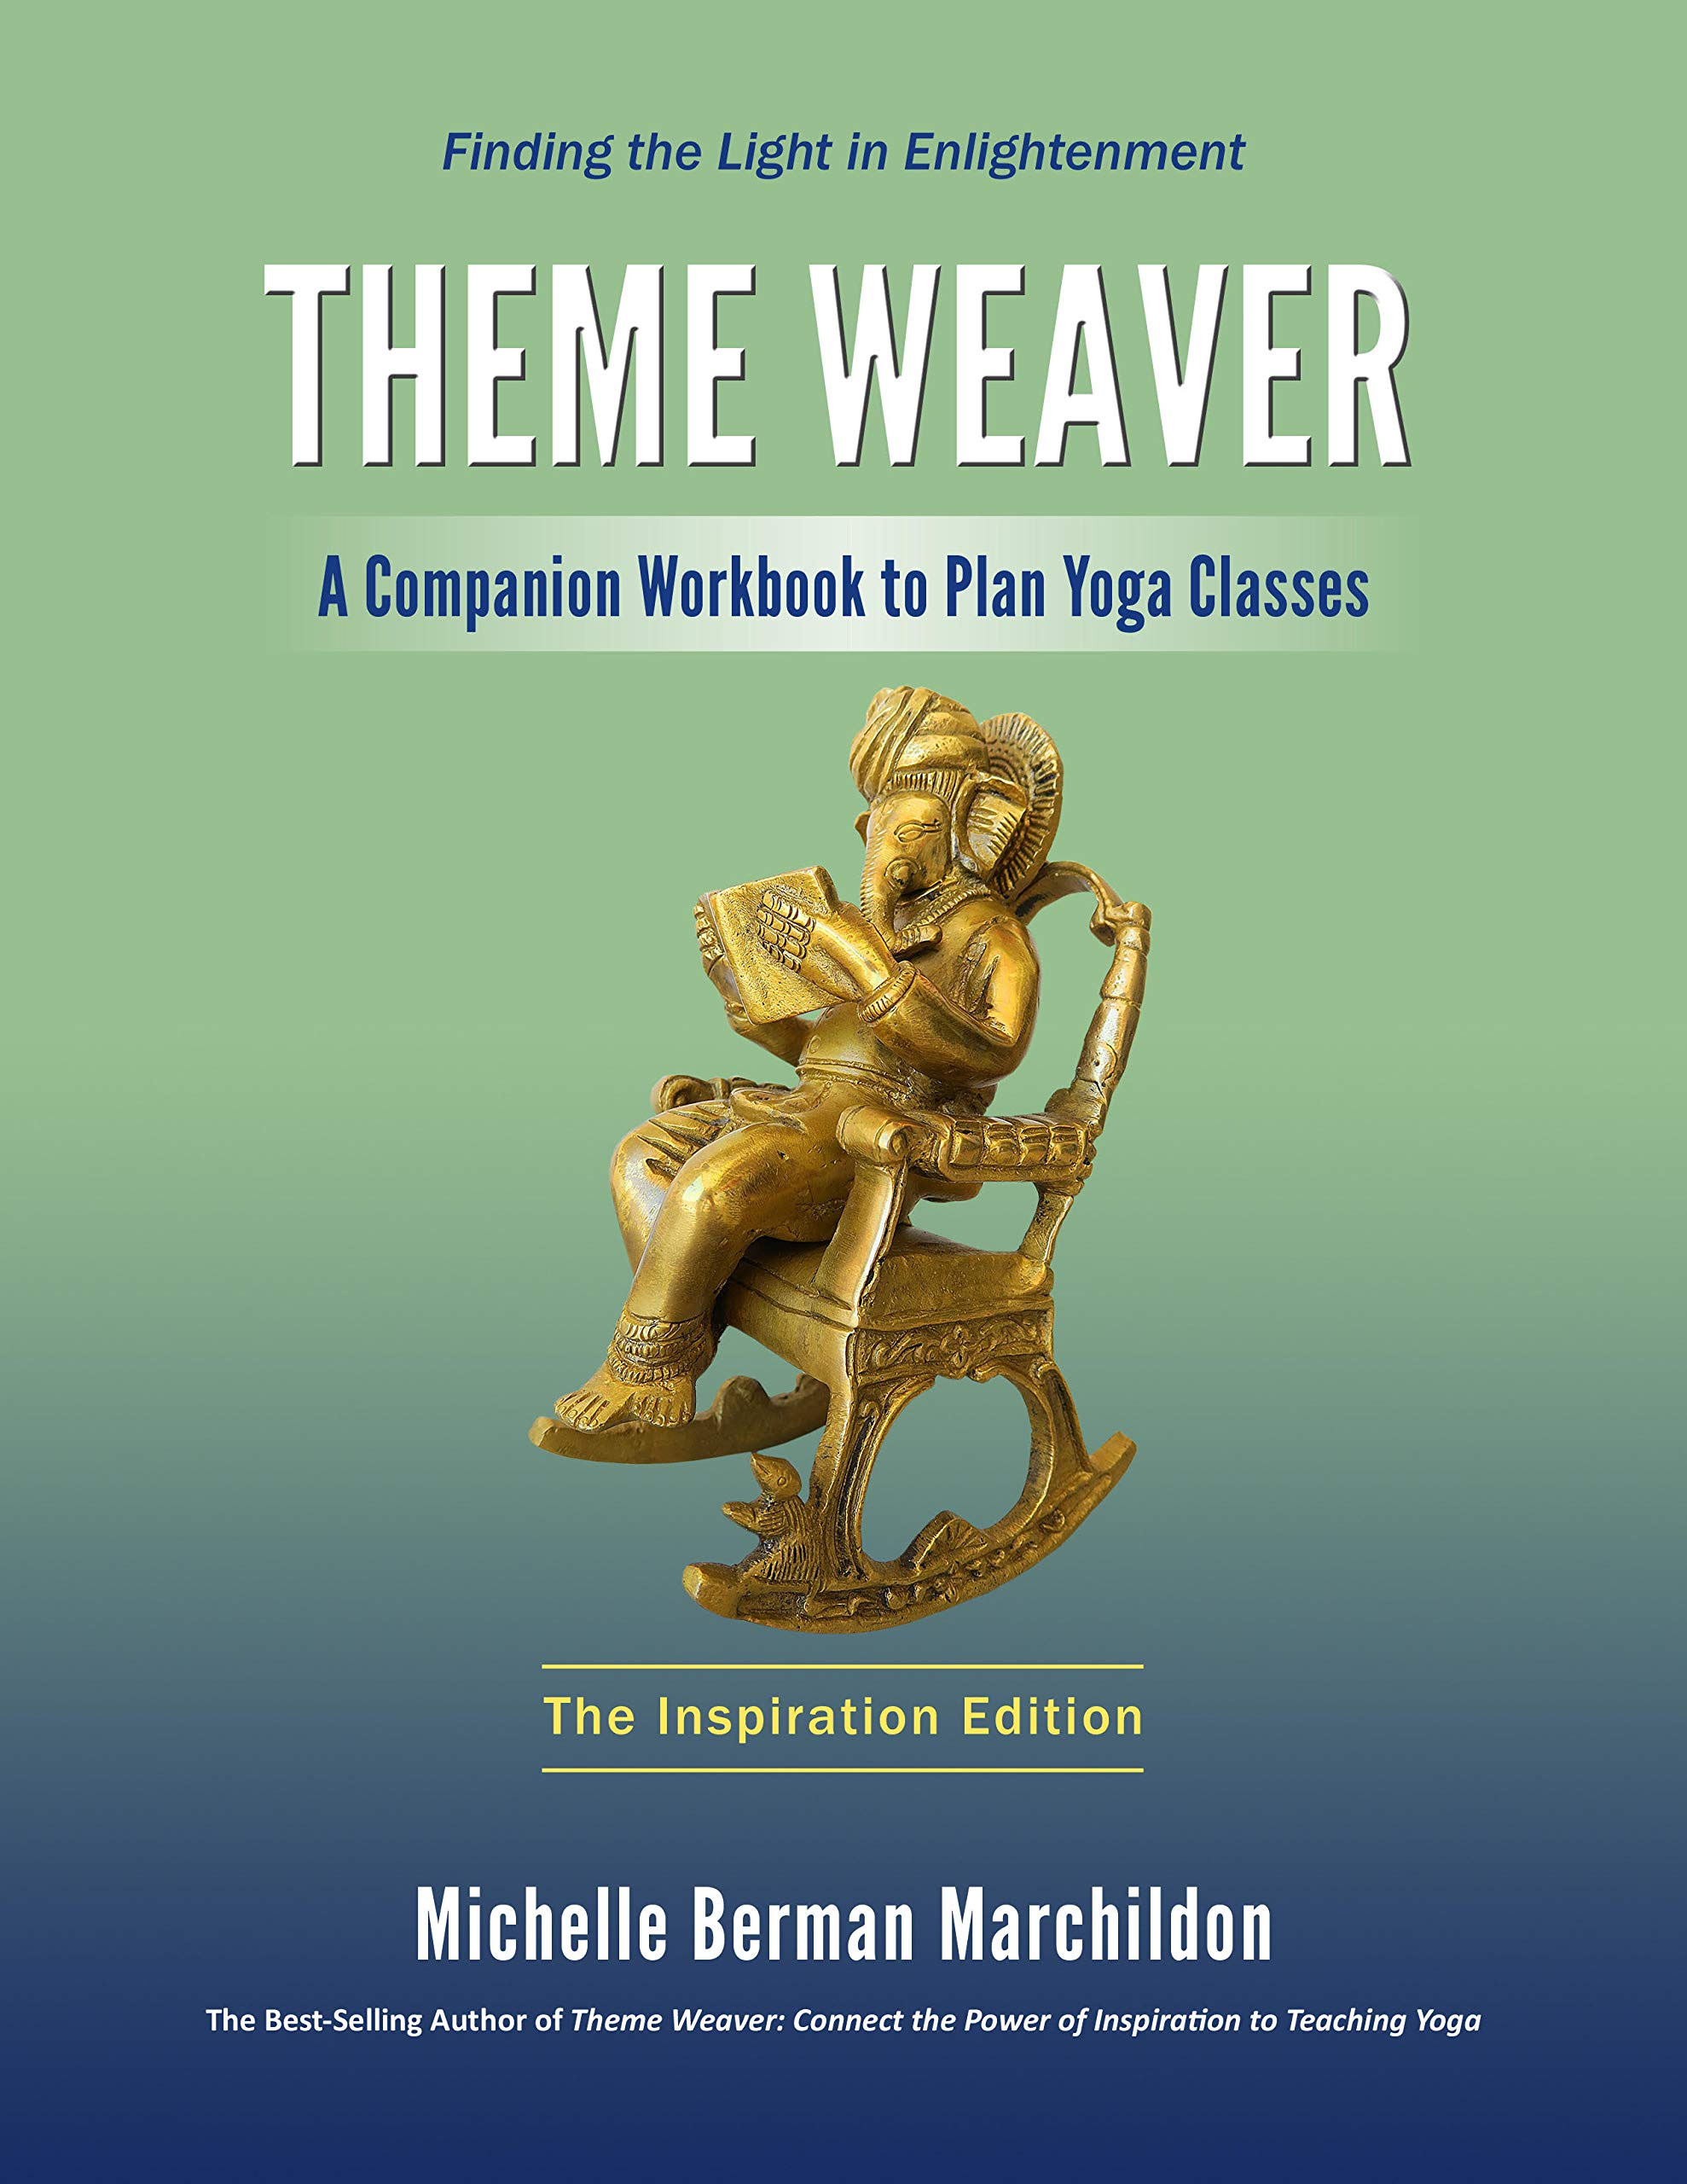 Amazon.com: Theme Weaver: A Companion Workbook to Plan Yoga ...